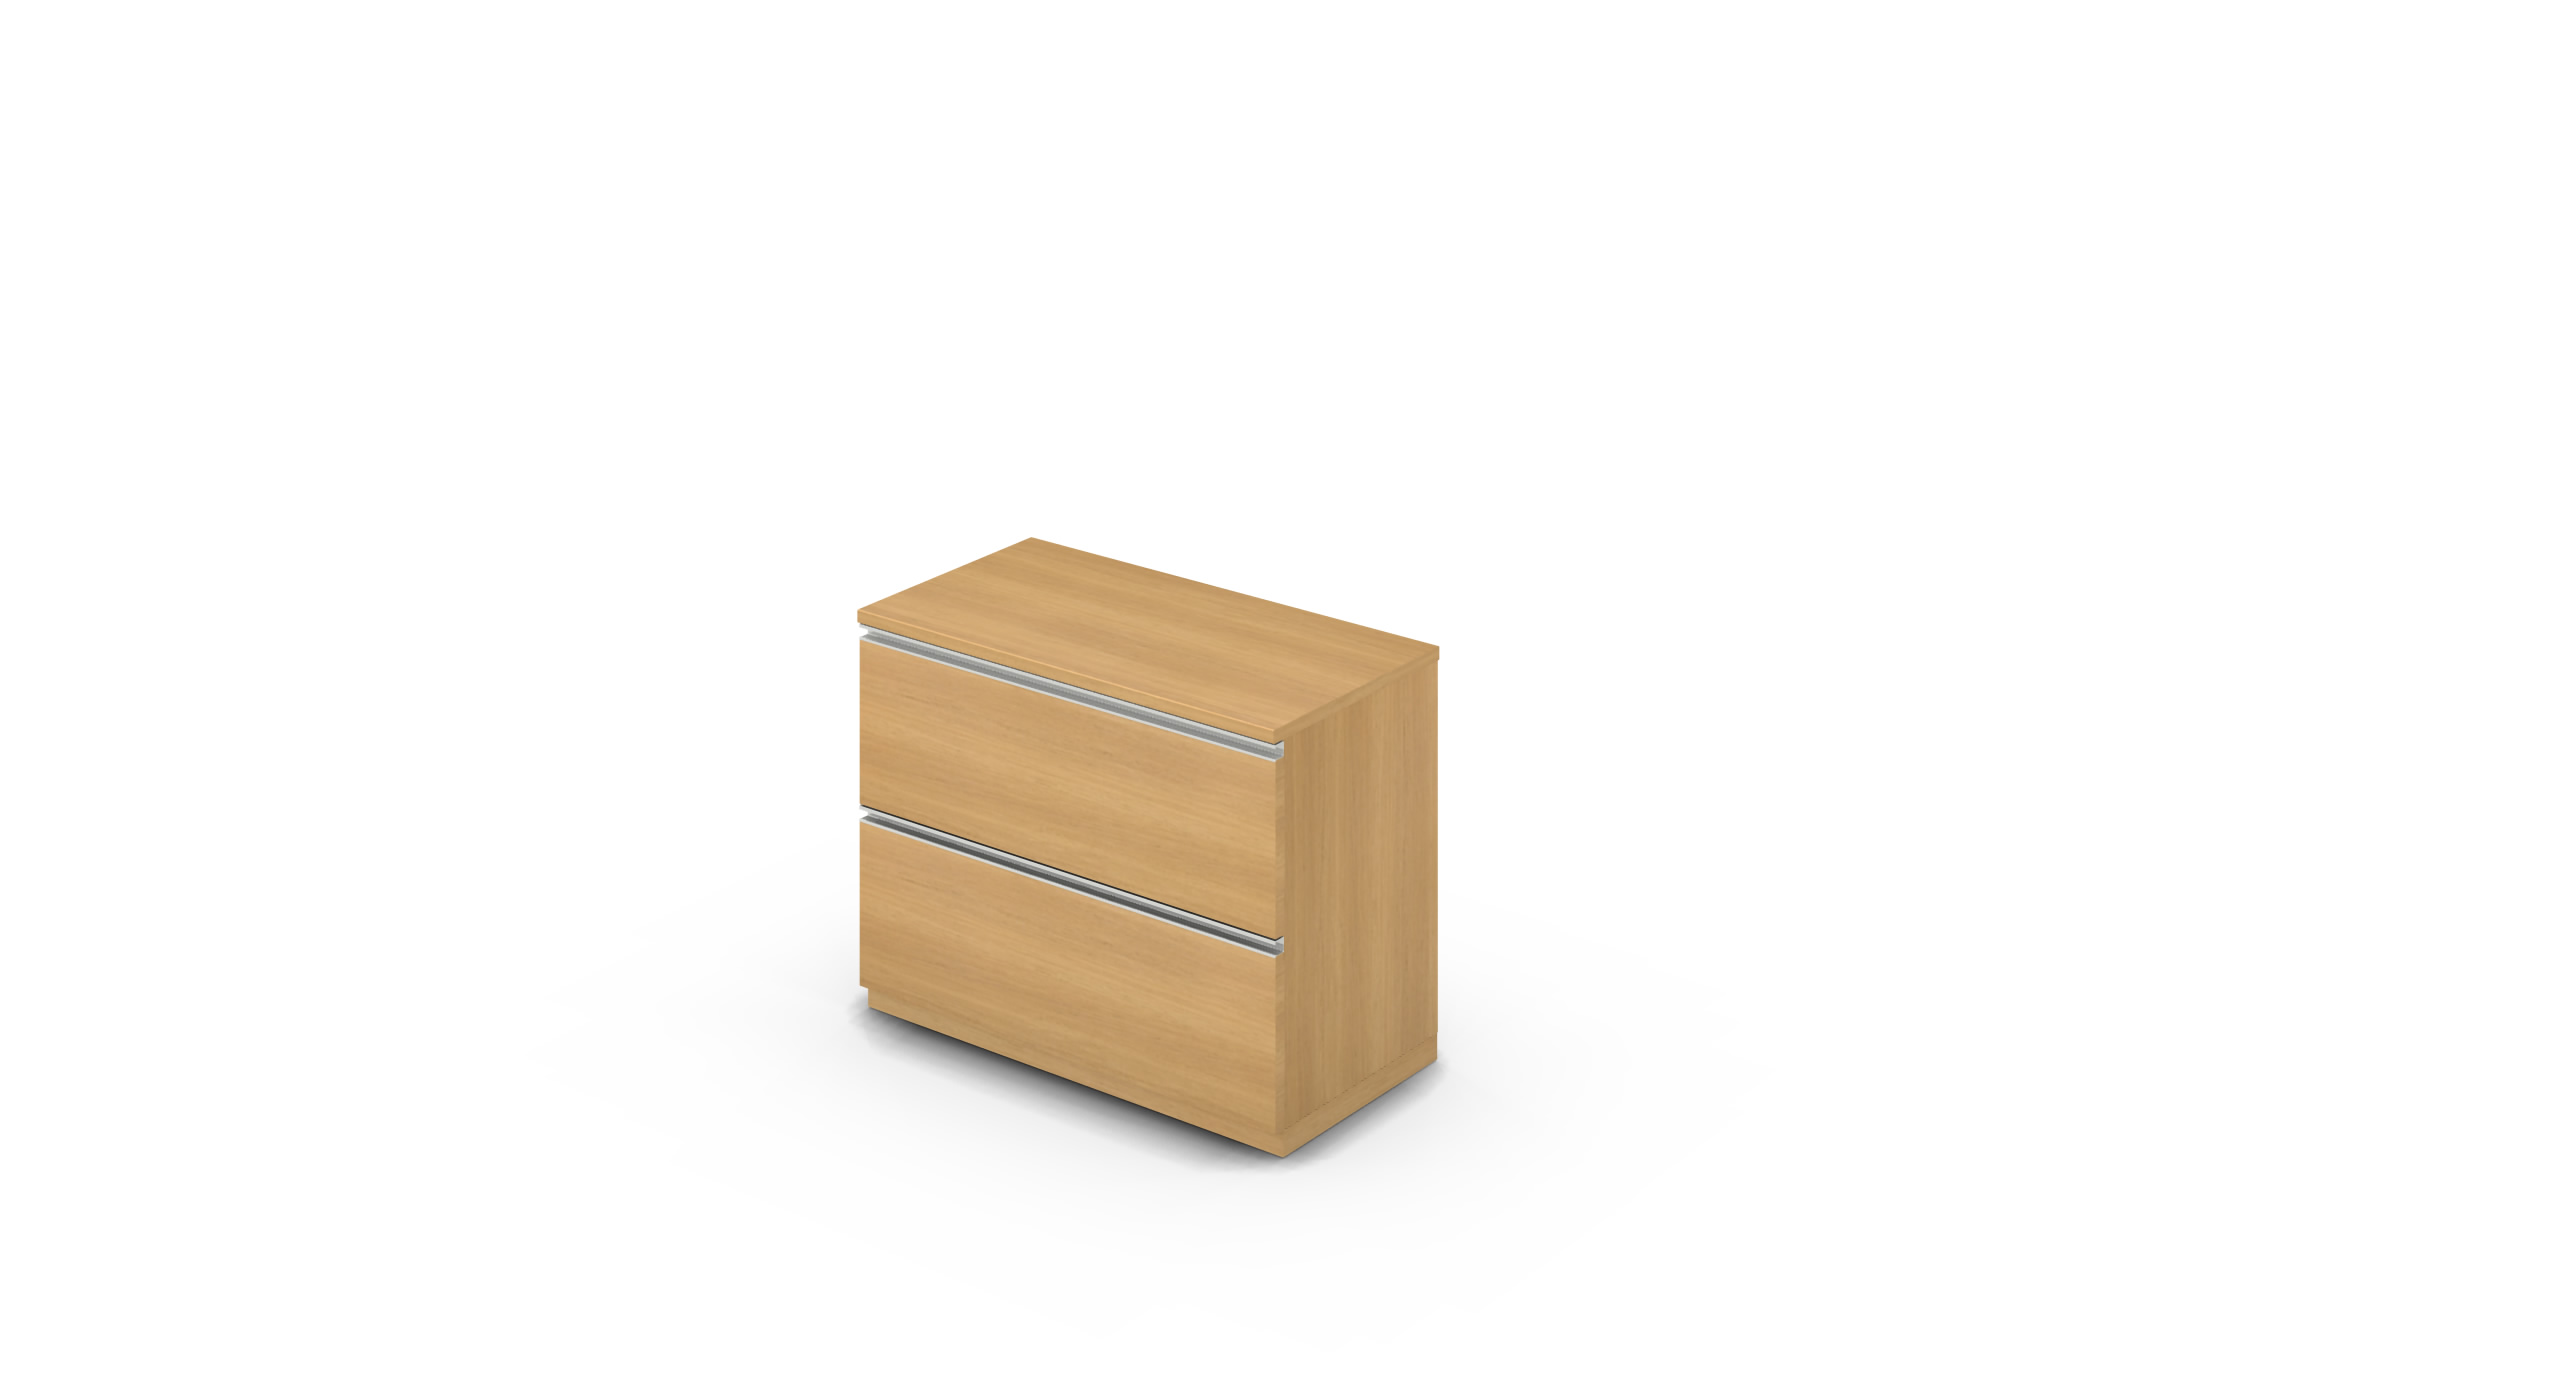 Cabinet_900x450x775_DR_Oak_Rail_NoCylinder